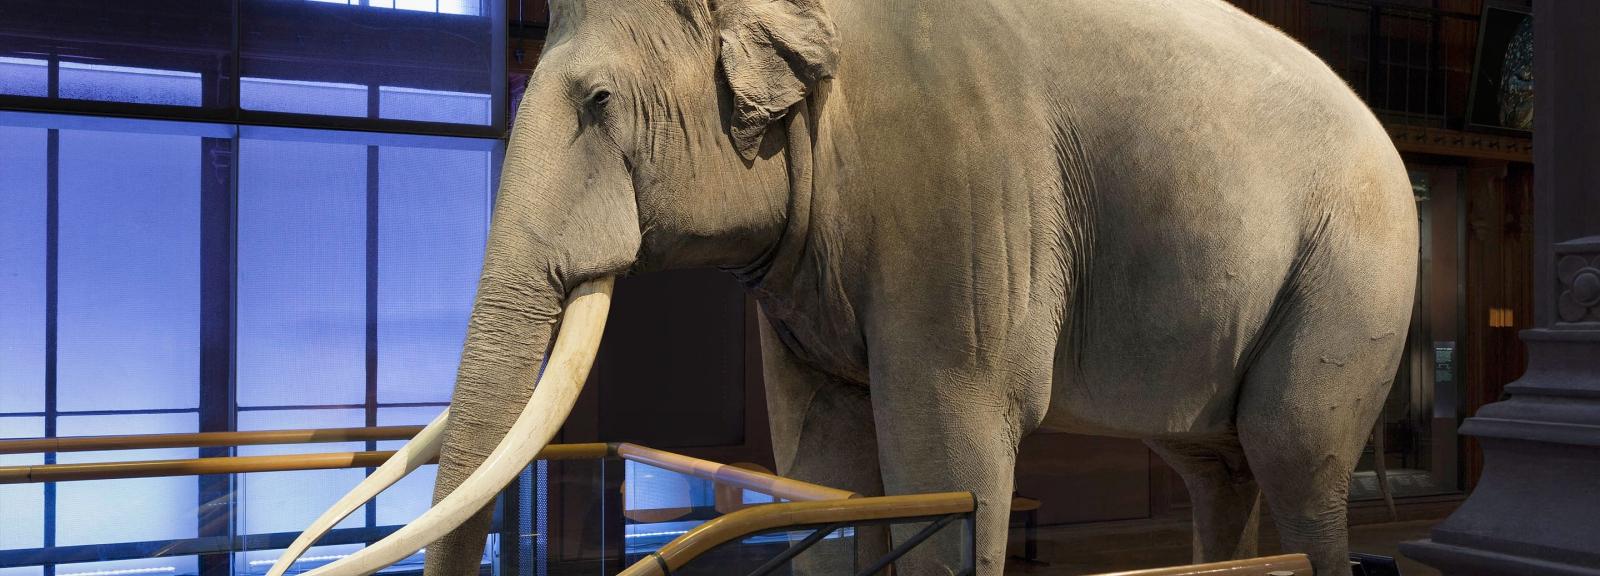 Siam, l'éléphant d'Asie (Elephas maximus) © MNHN - B. Faye